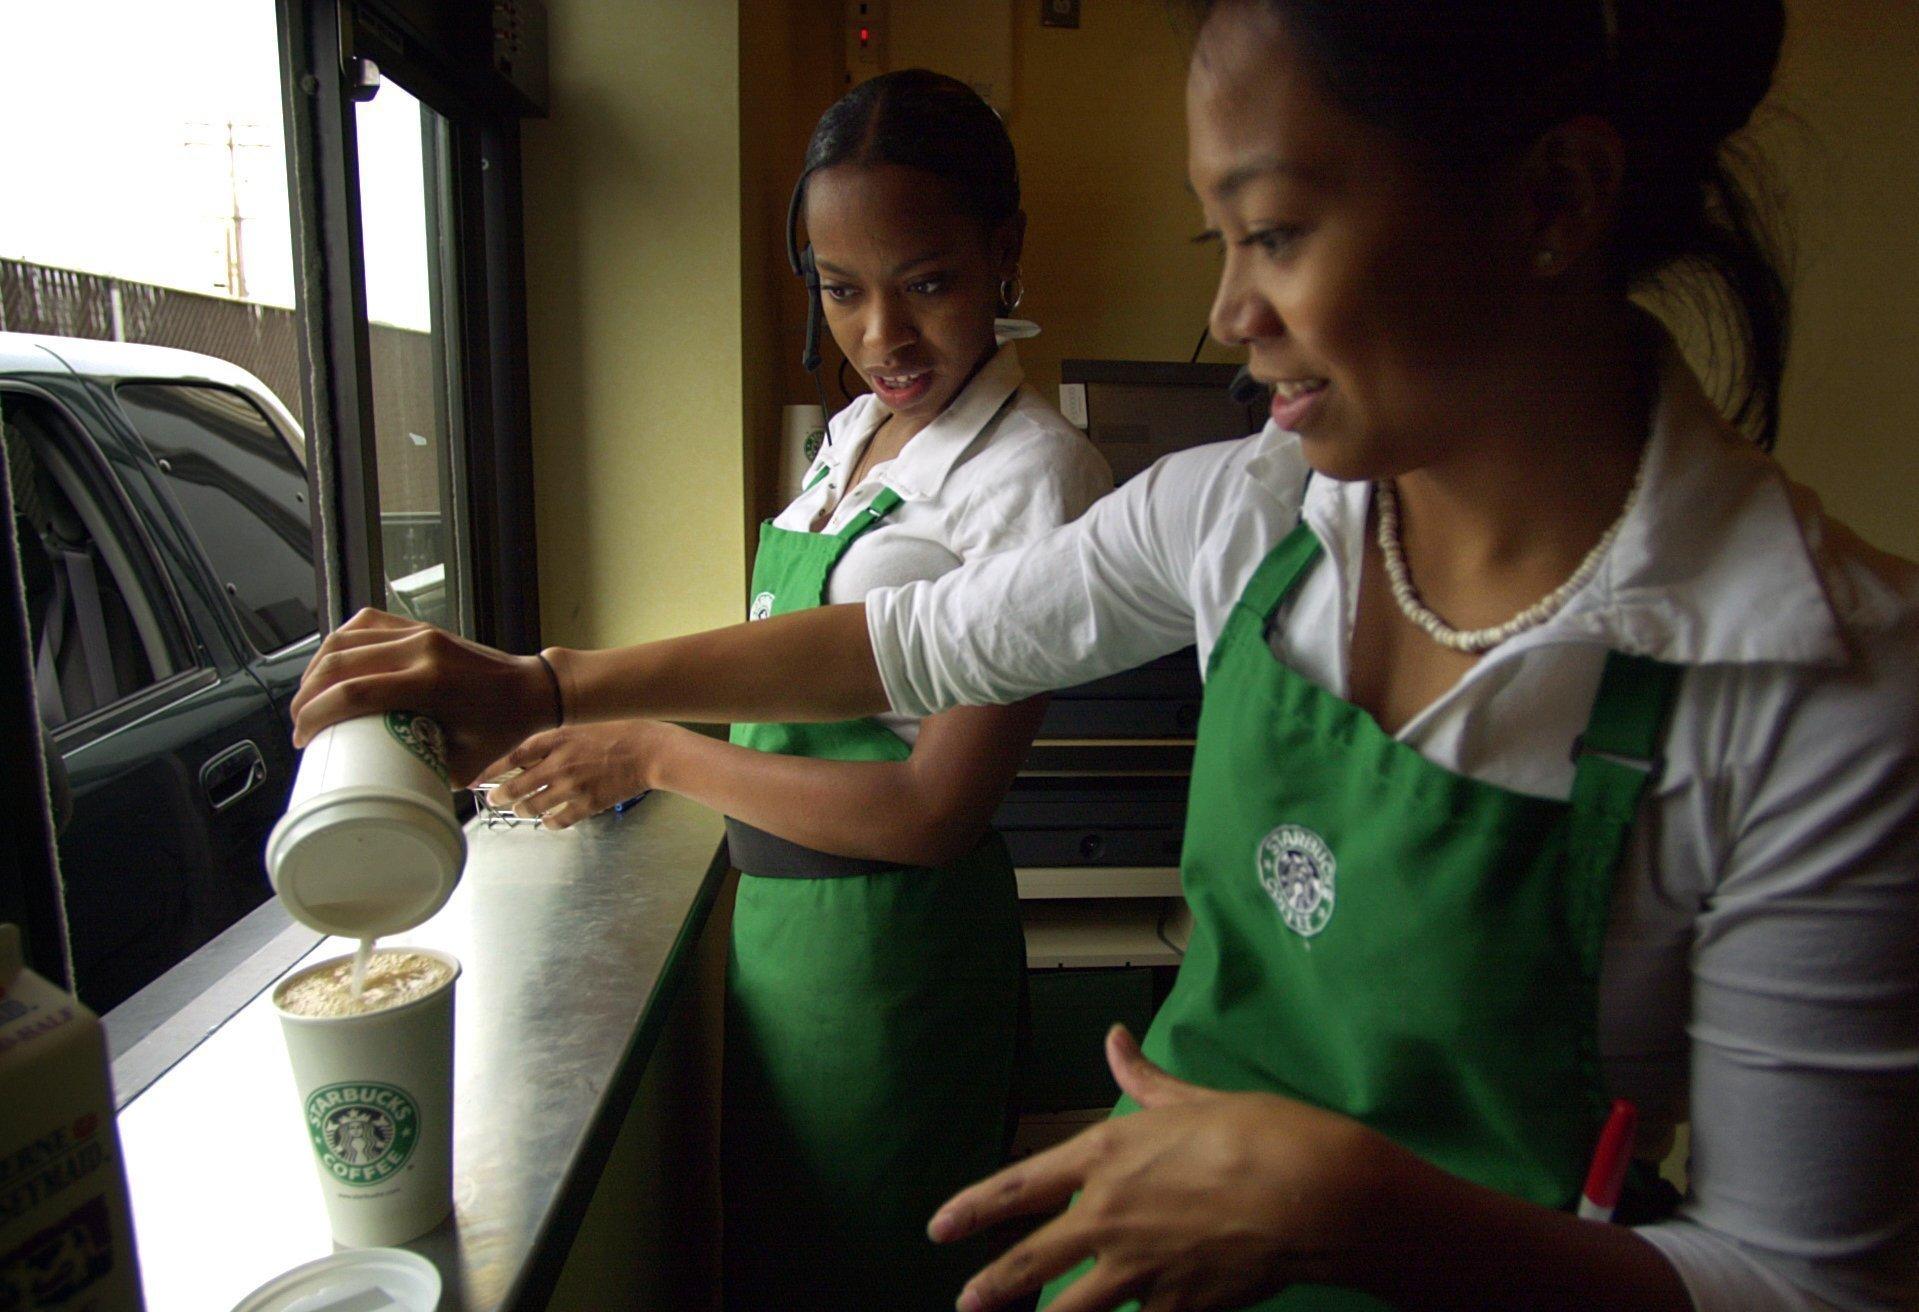 Starbucks Employee Dress Code Shoes